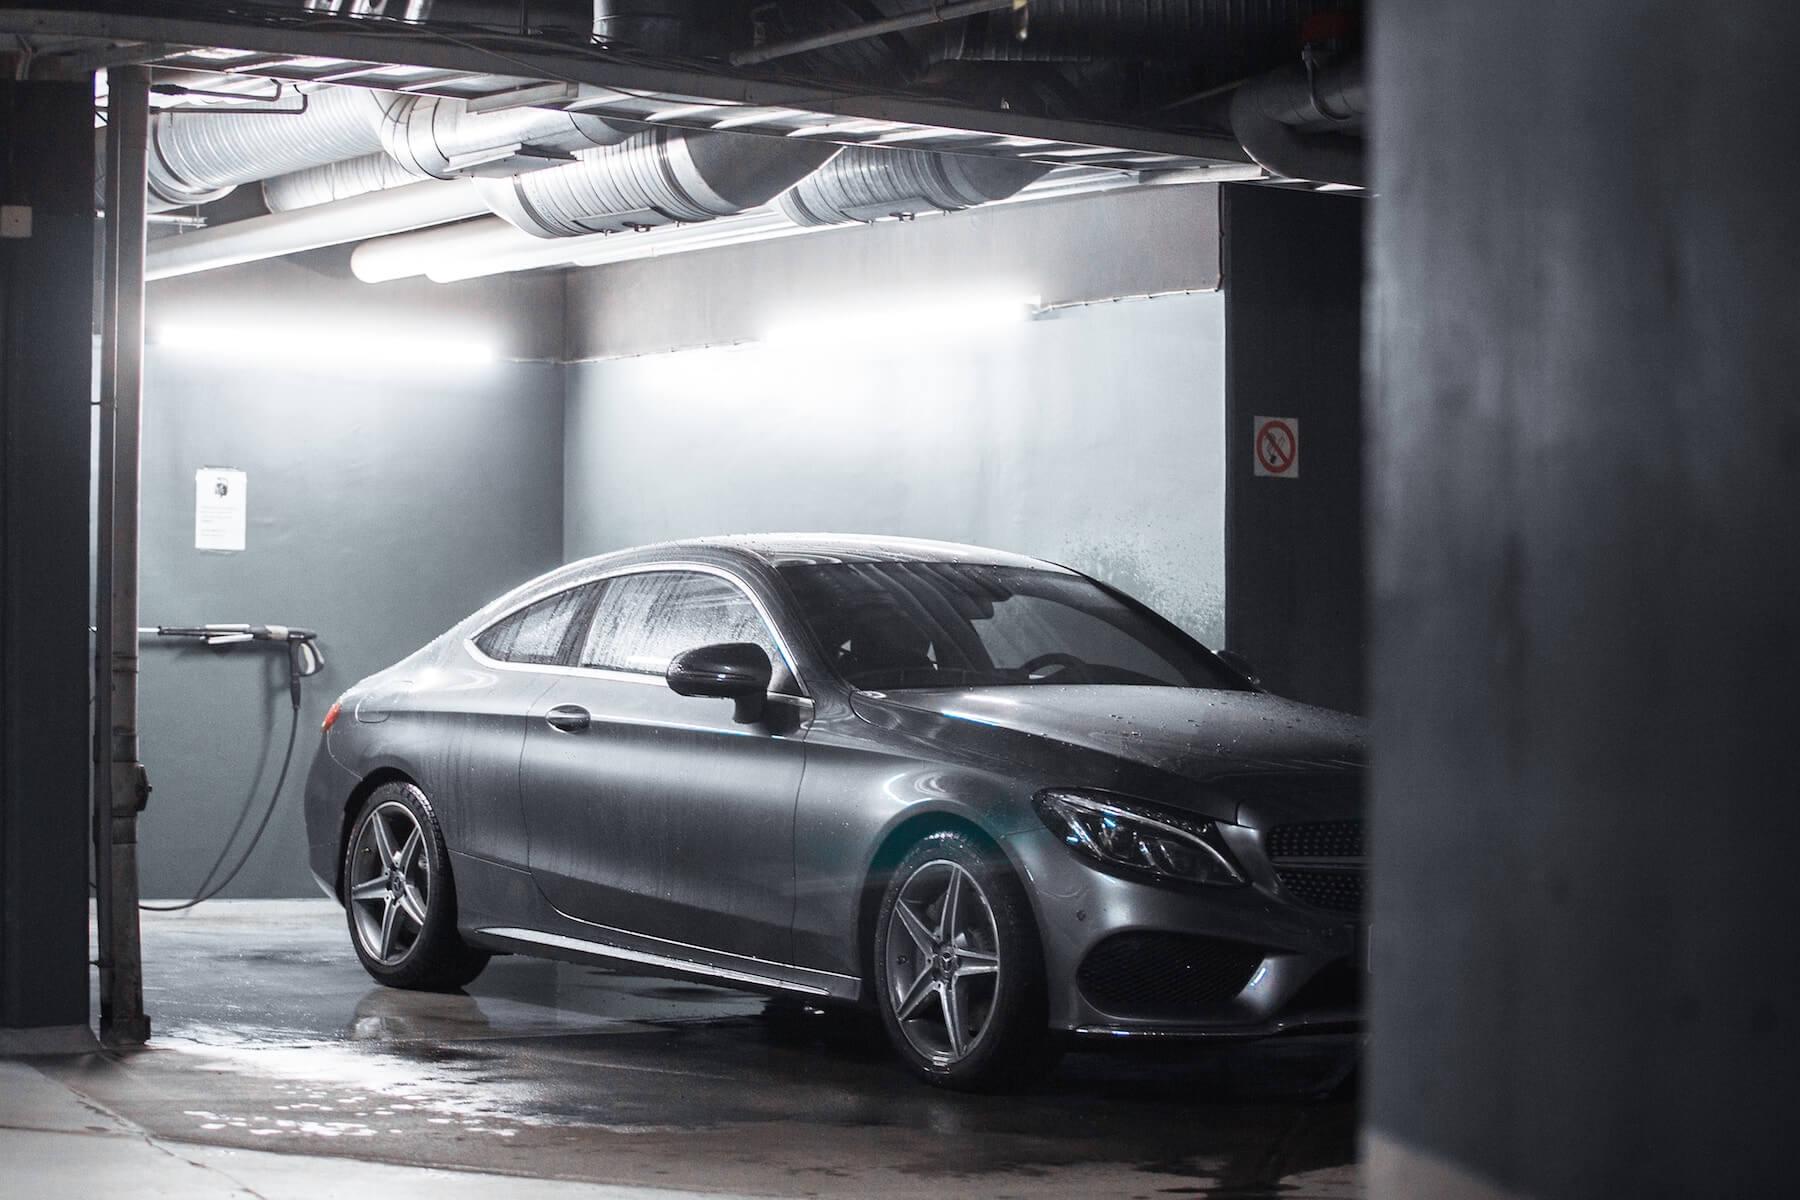 Mercedes undergoing Paint Protection Film Maintenance